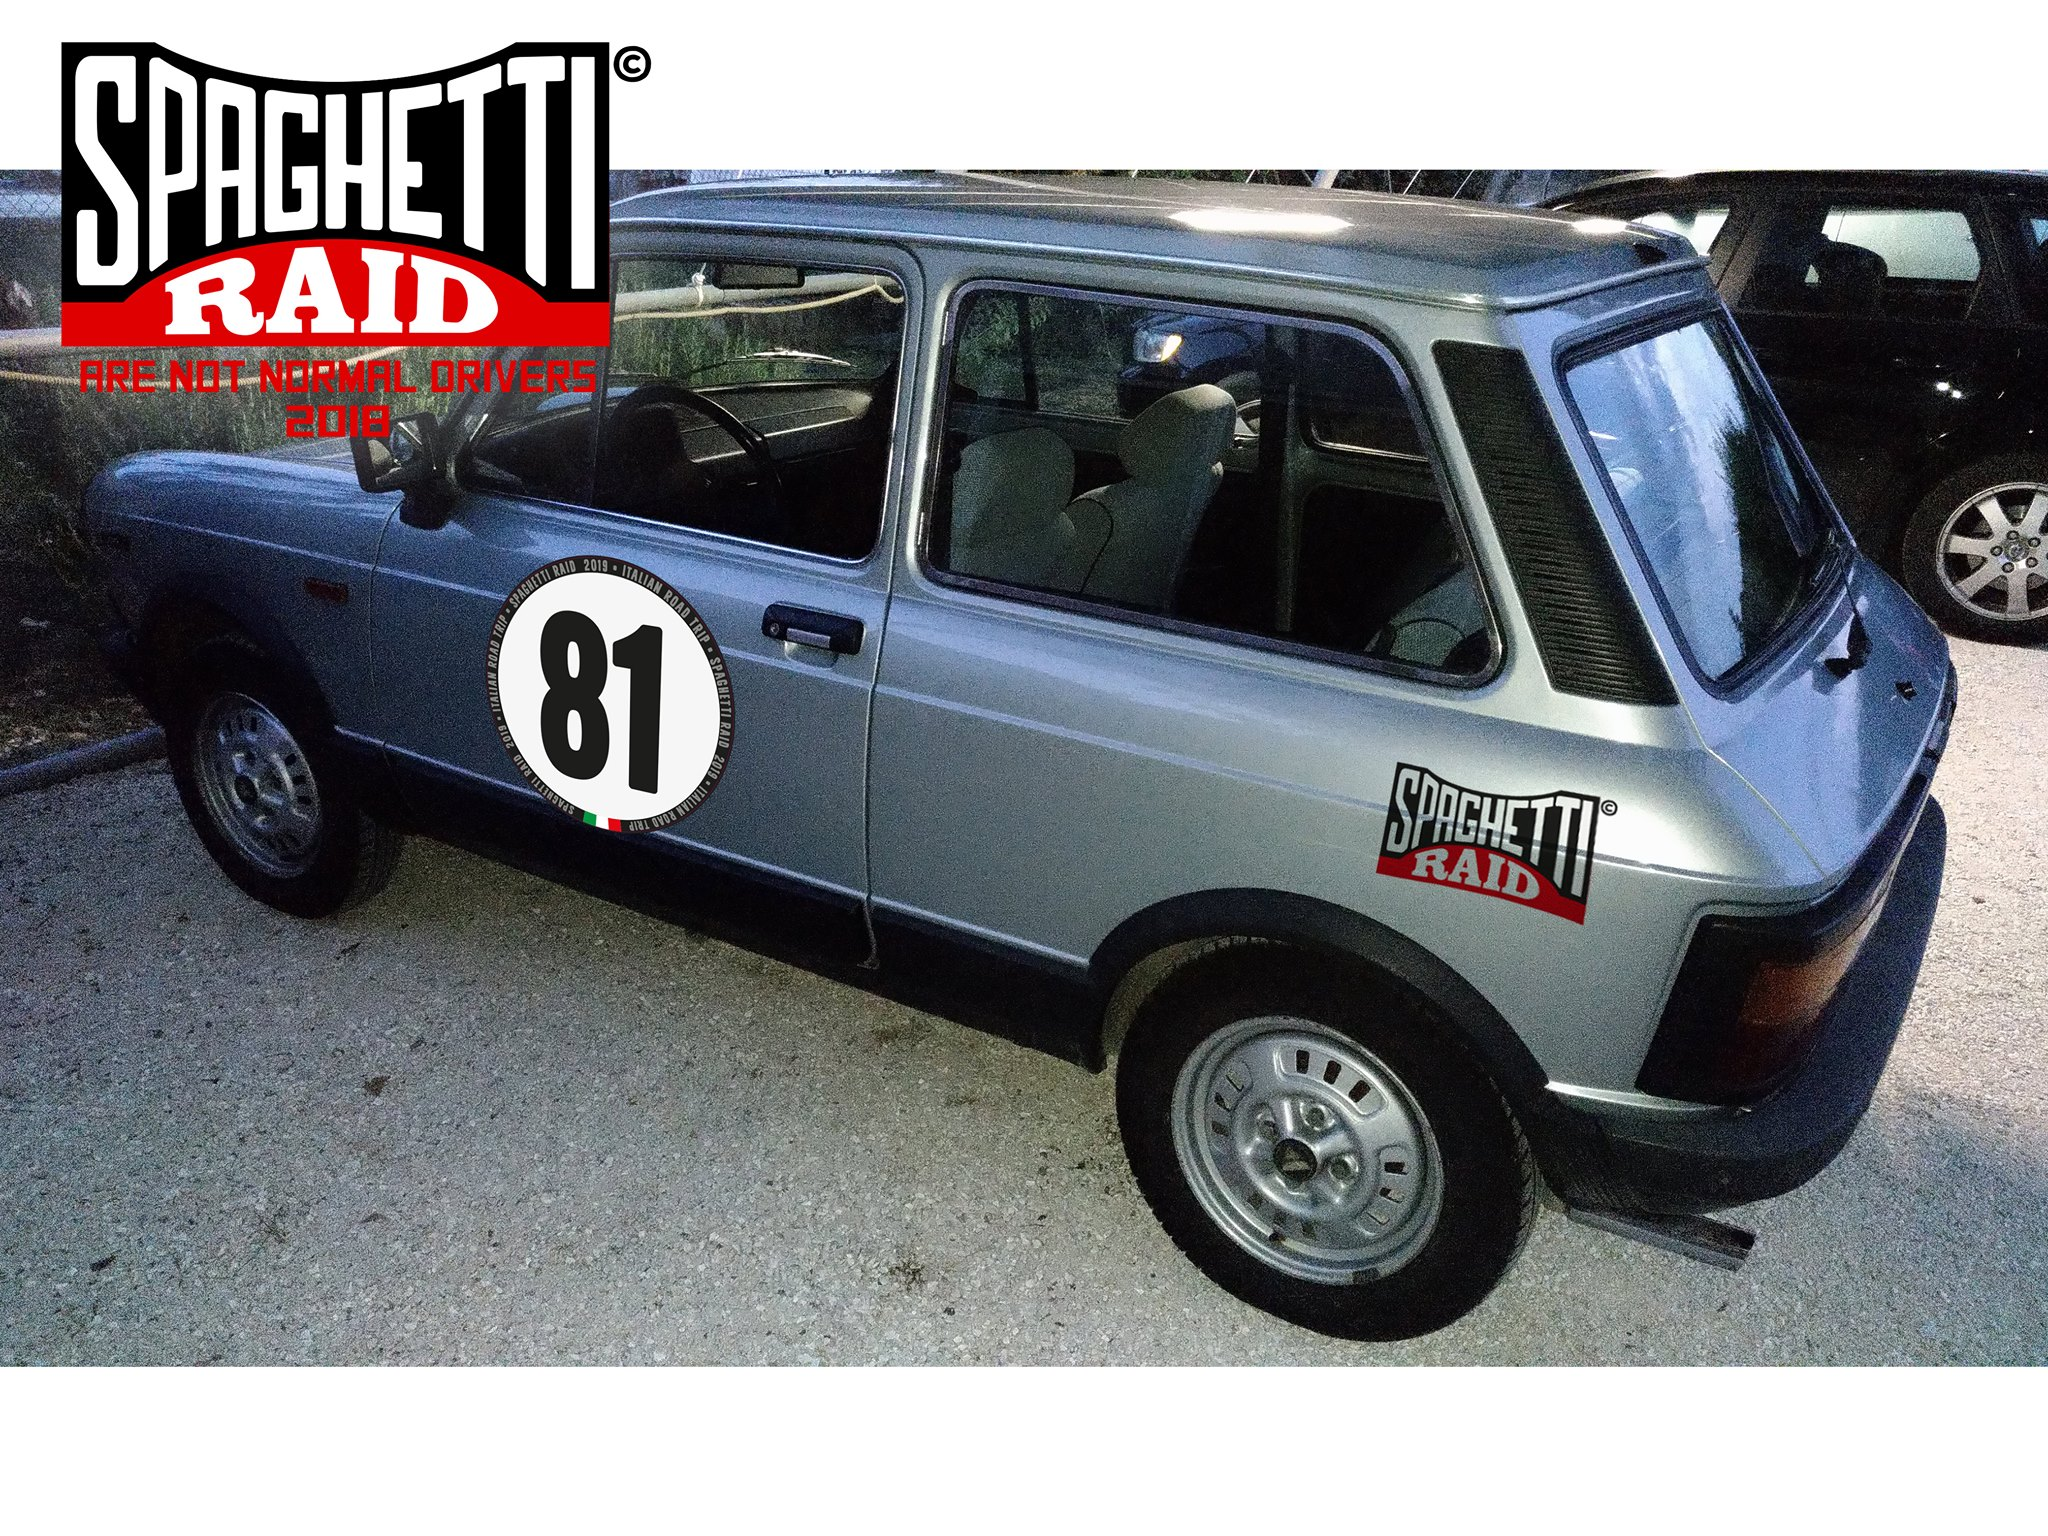 Team THE CINQUEDODICI #81 AUTOBIANCHI A112 ELITE del 1981 città Perugia